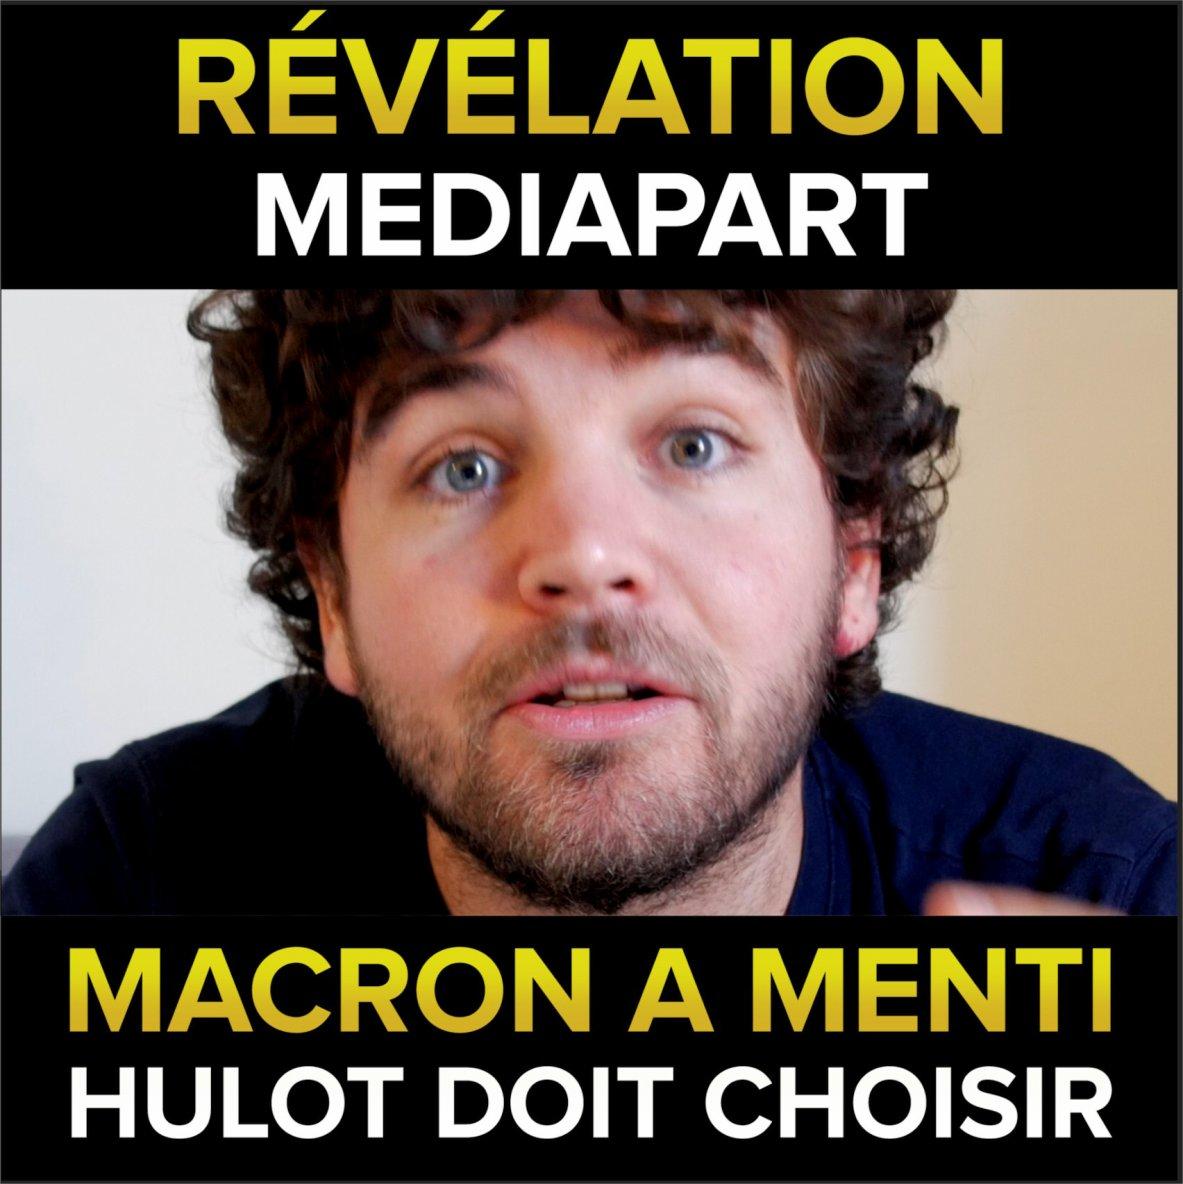 Révélations Mediapart : Macron a menti, Hulot doit choisir - Osons Causer